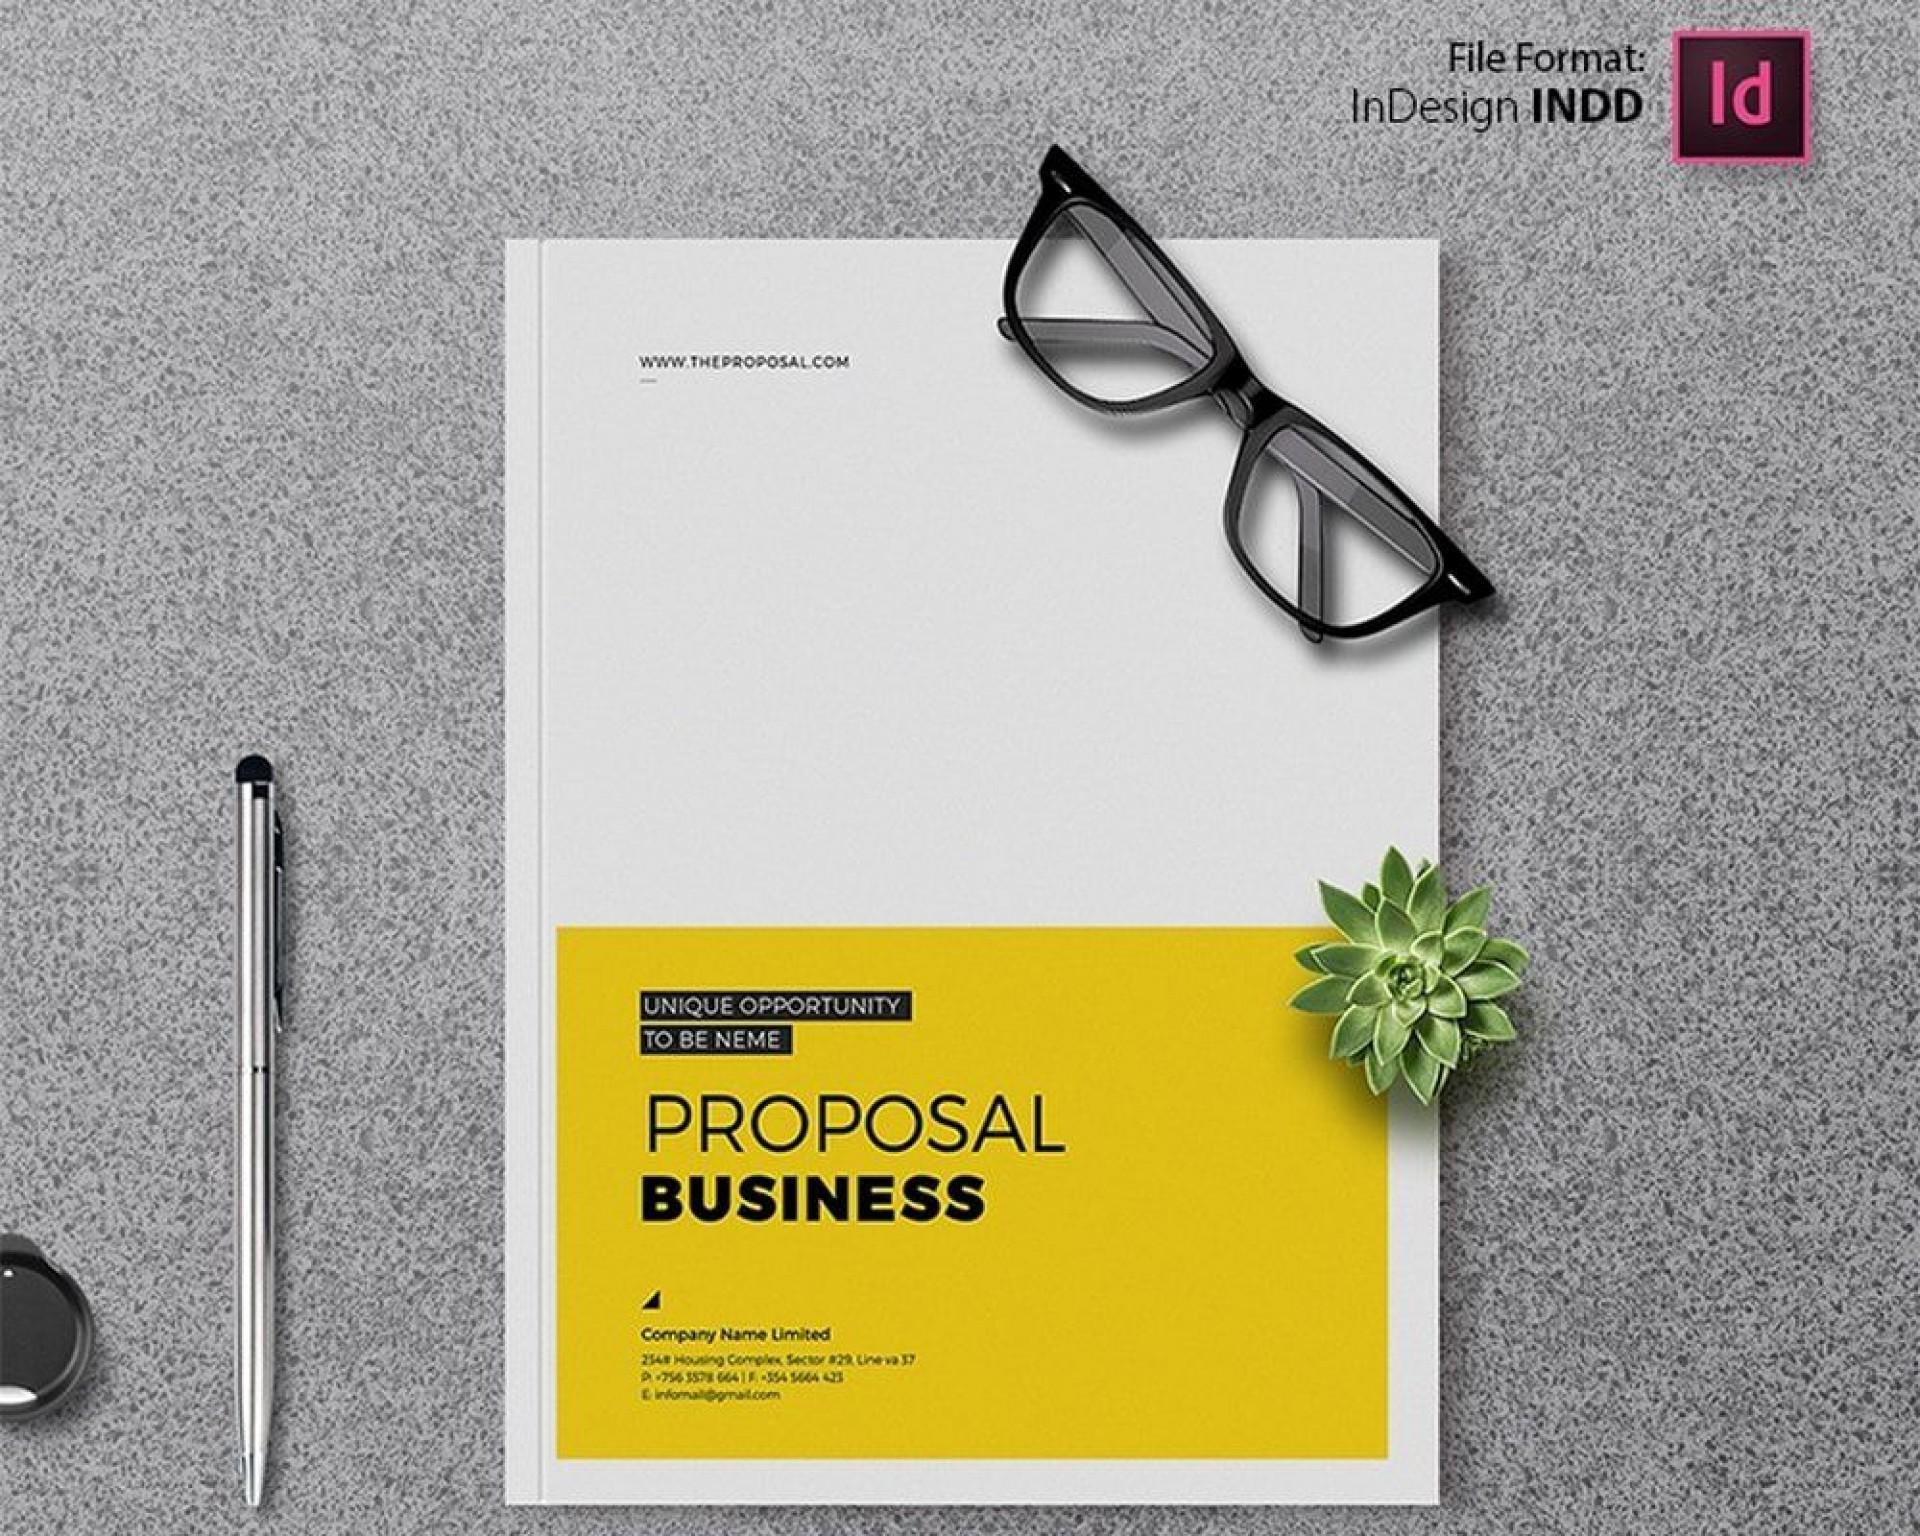 008 Impressive Adobe Indesign Brochure Template Free Download Idea 1920